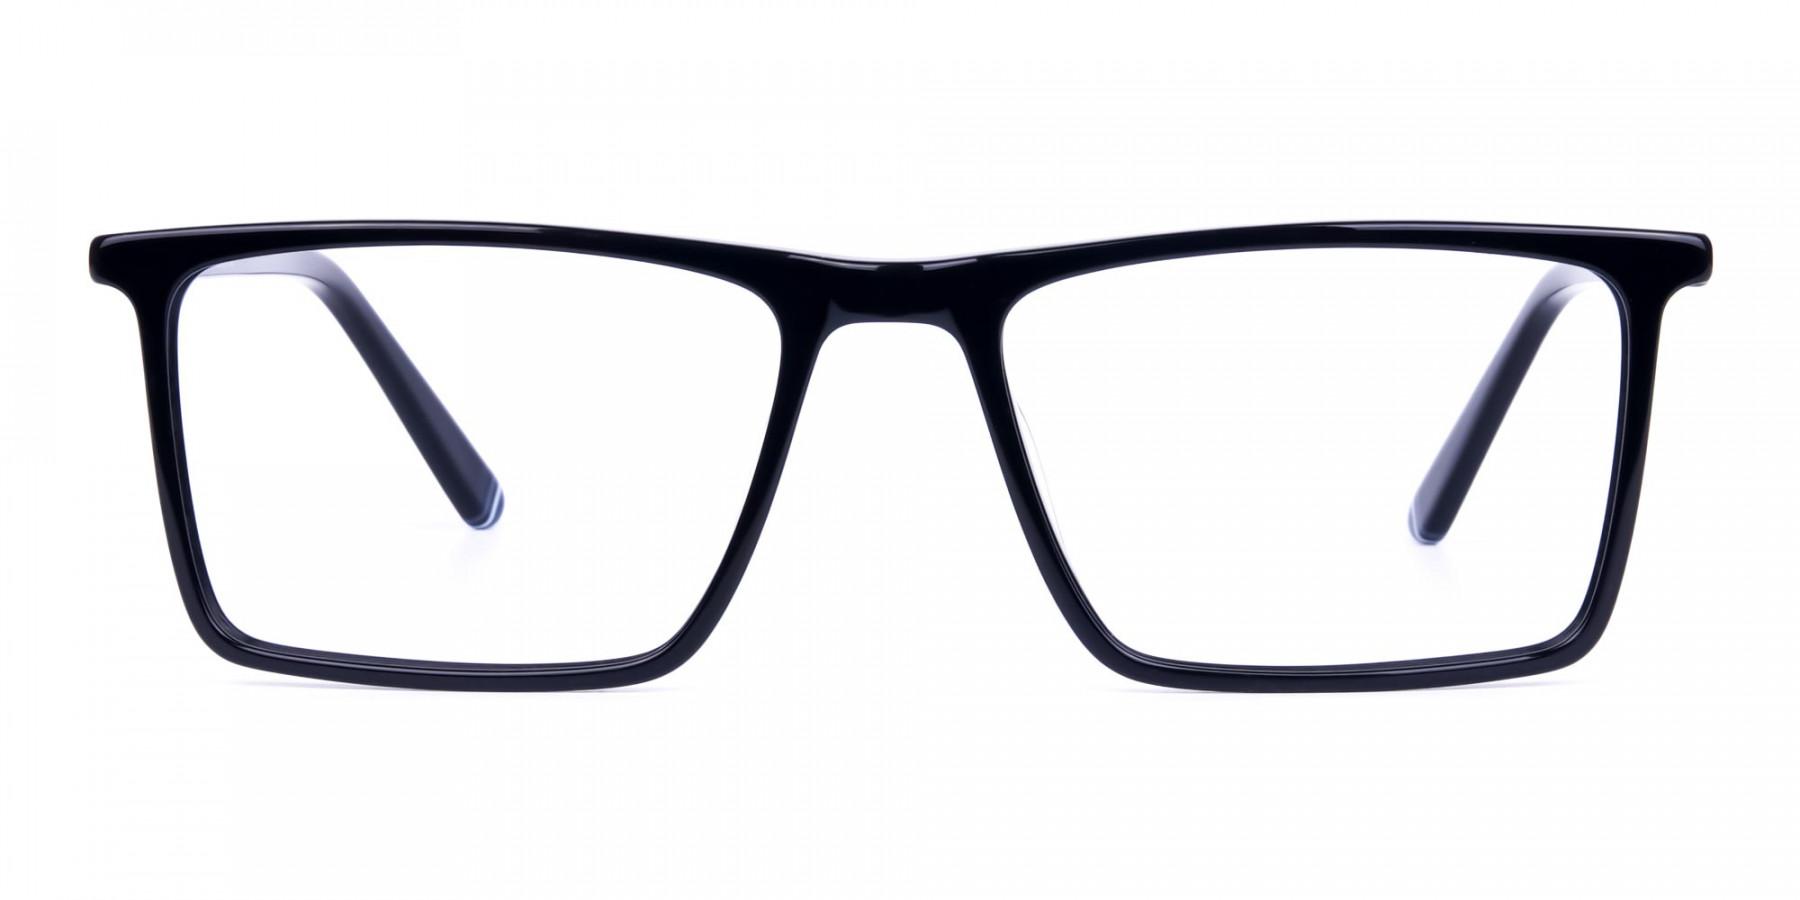 Fashionable-Black-Full-Rim-Rectangular-Glasses-1